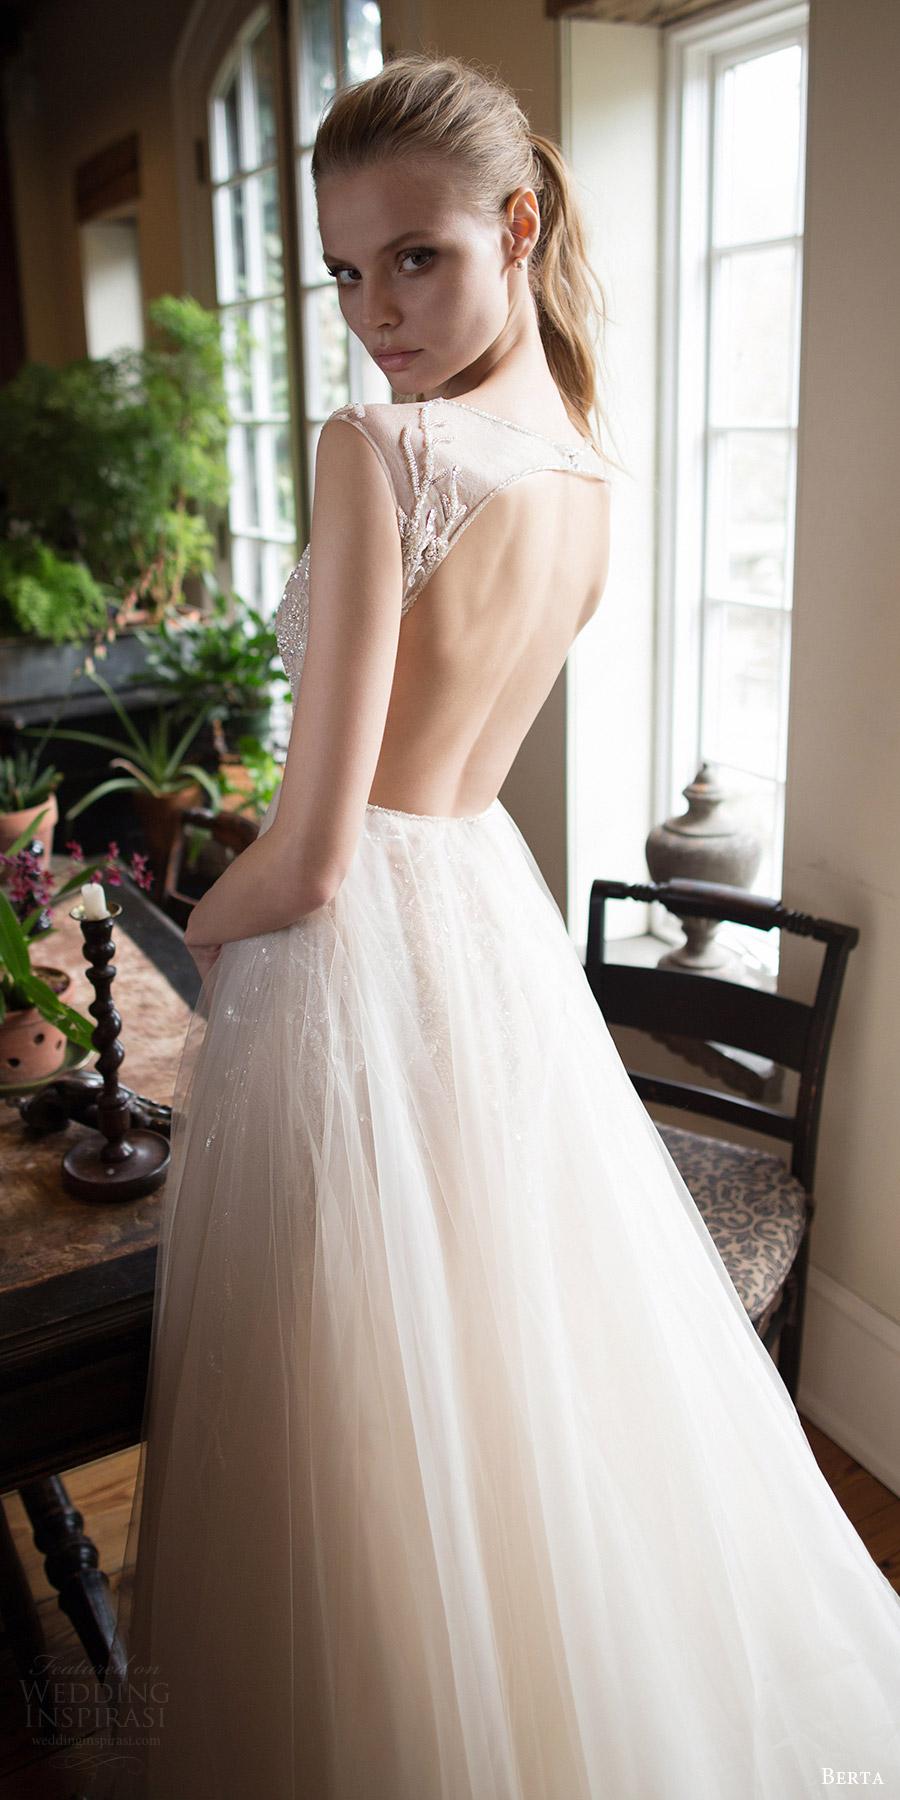 berta bridal fall 2016 sleeveless illusion jewel neck aline wedding dress (16 105) bv keyhole